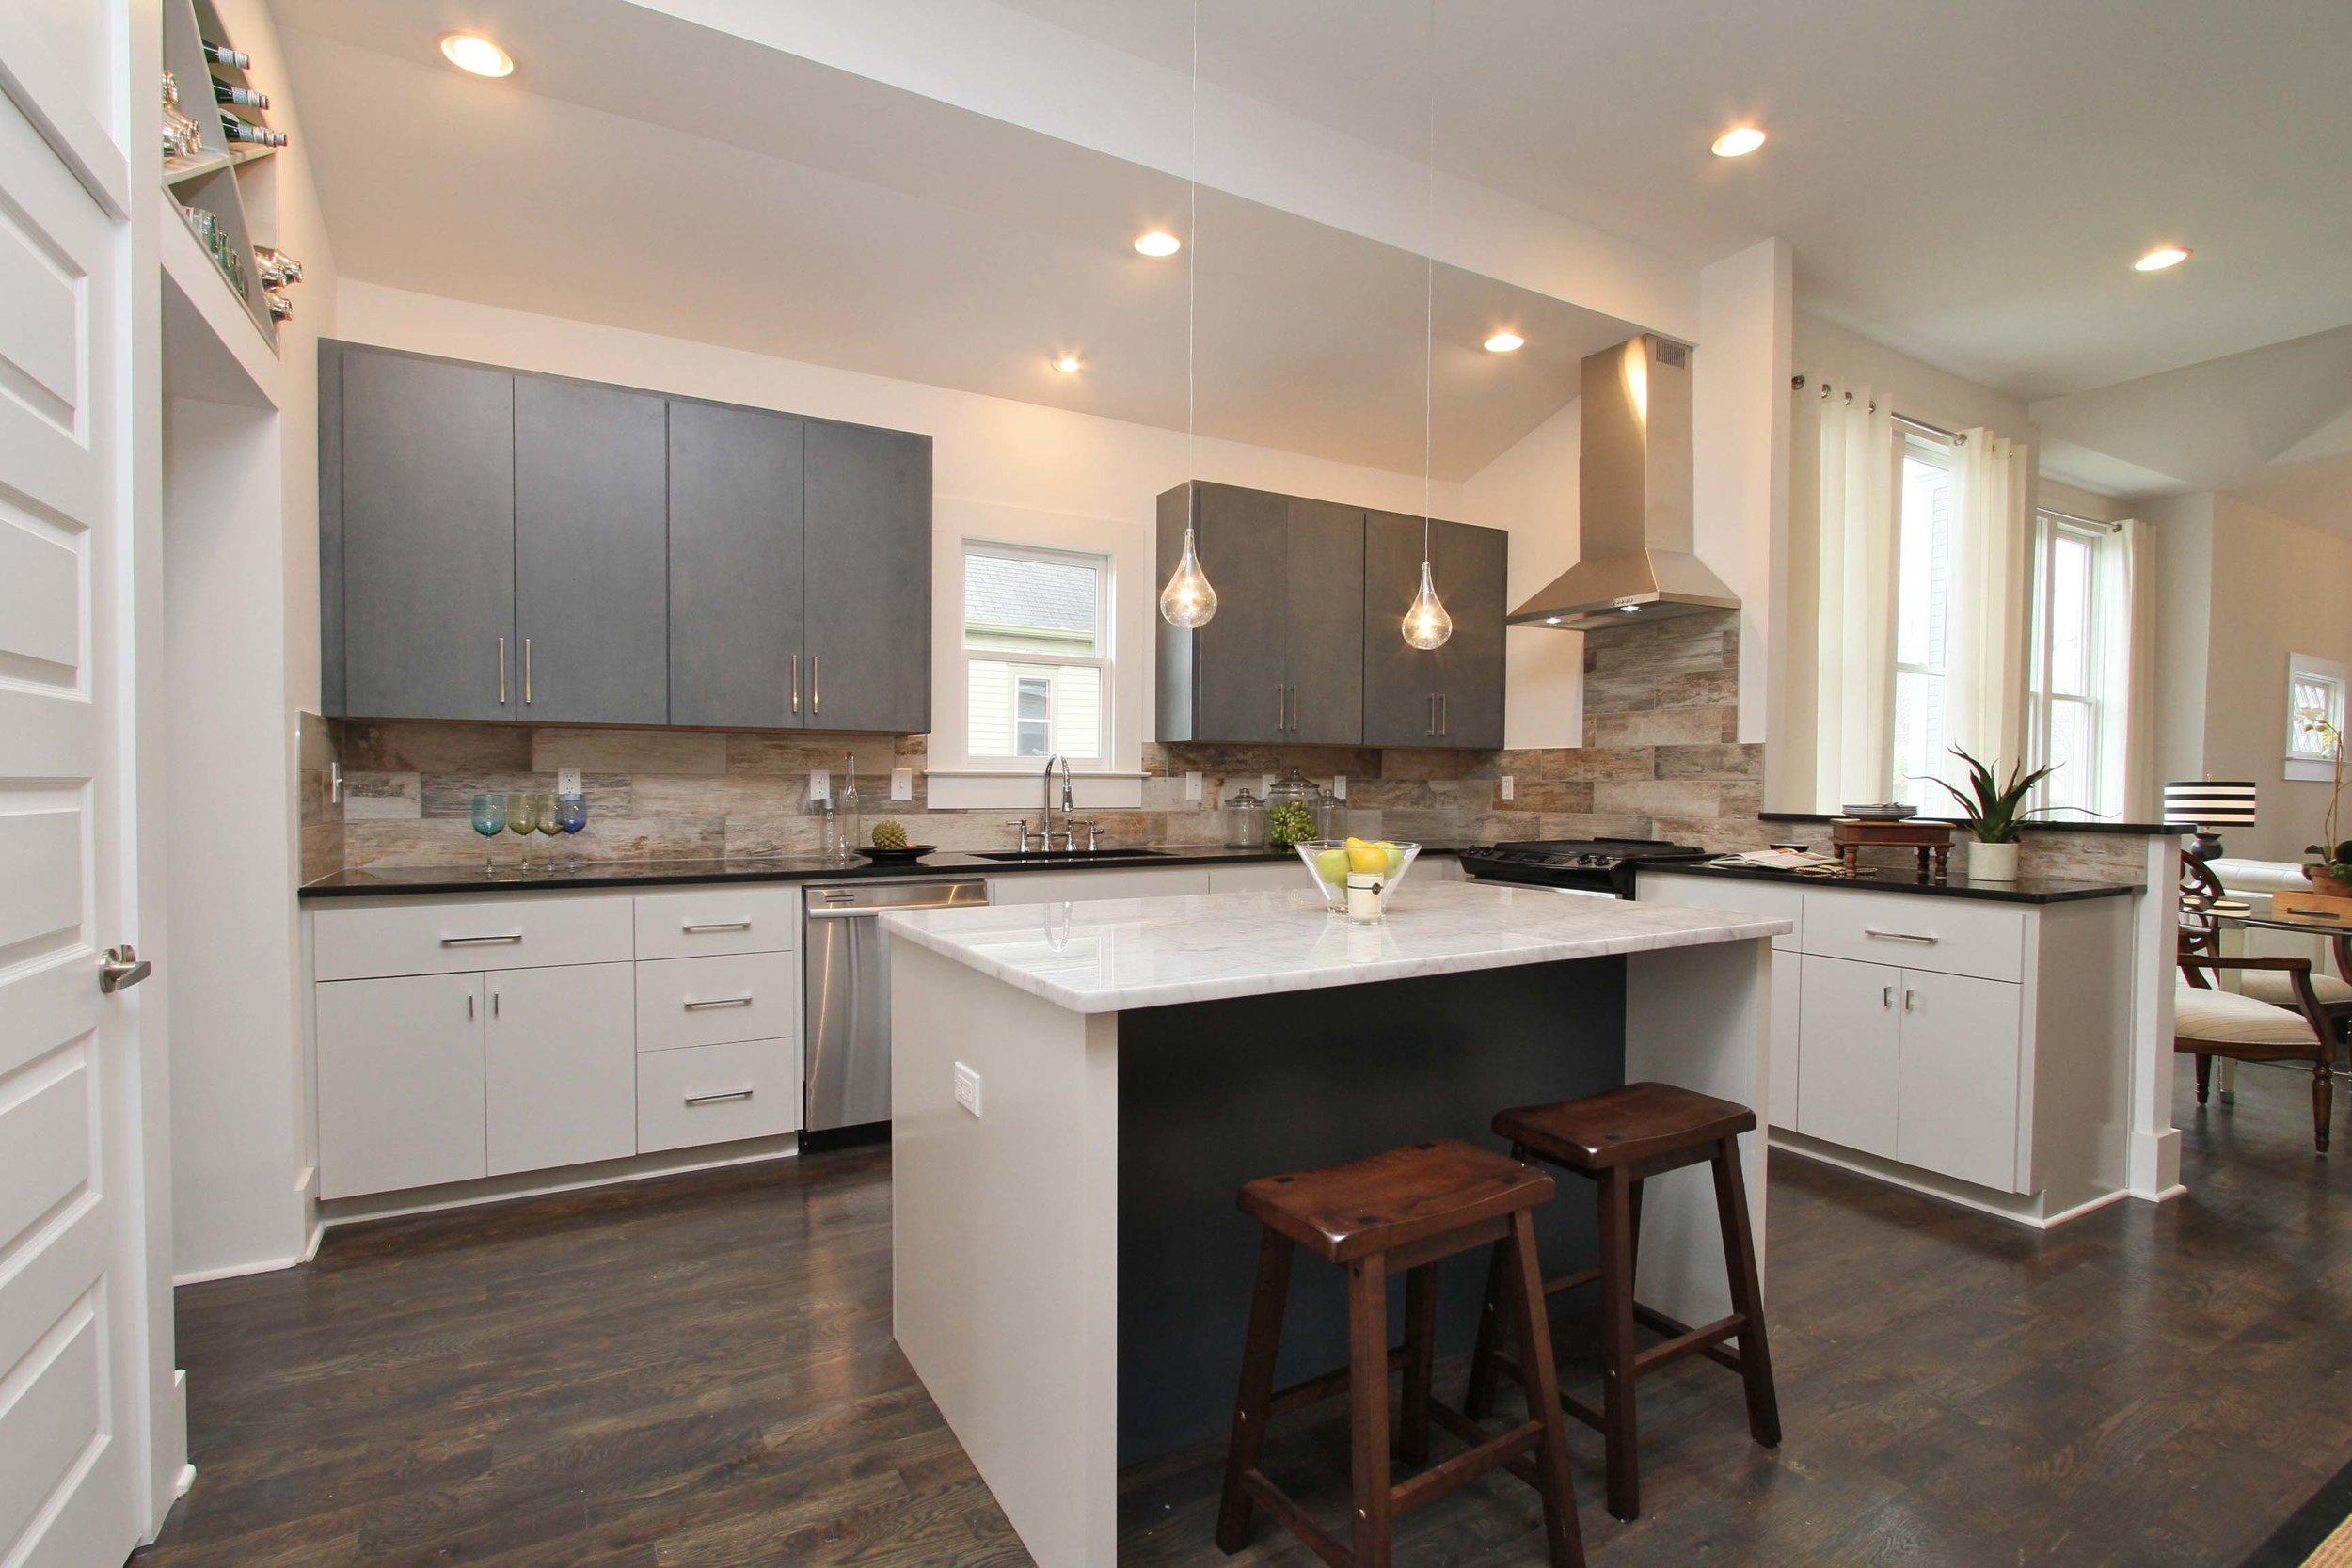 House-Plans-Online-Craftsman-Nashville-Peggy-Newman-Benton-Kitchen-Wine-Rack.jpg